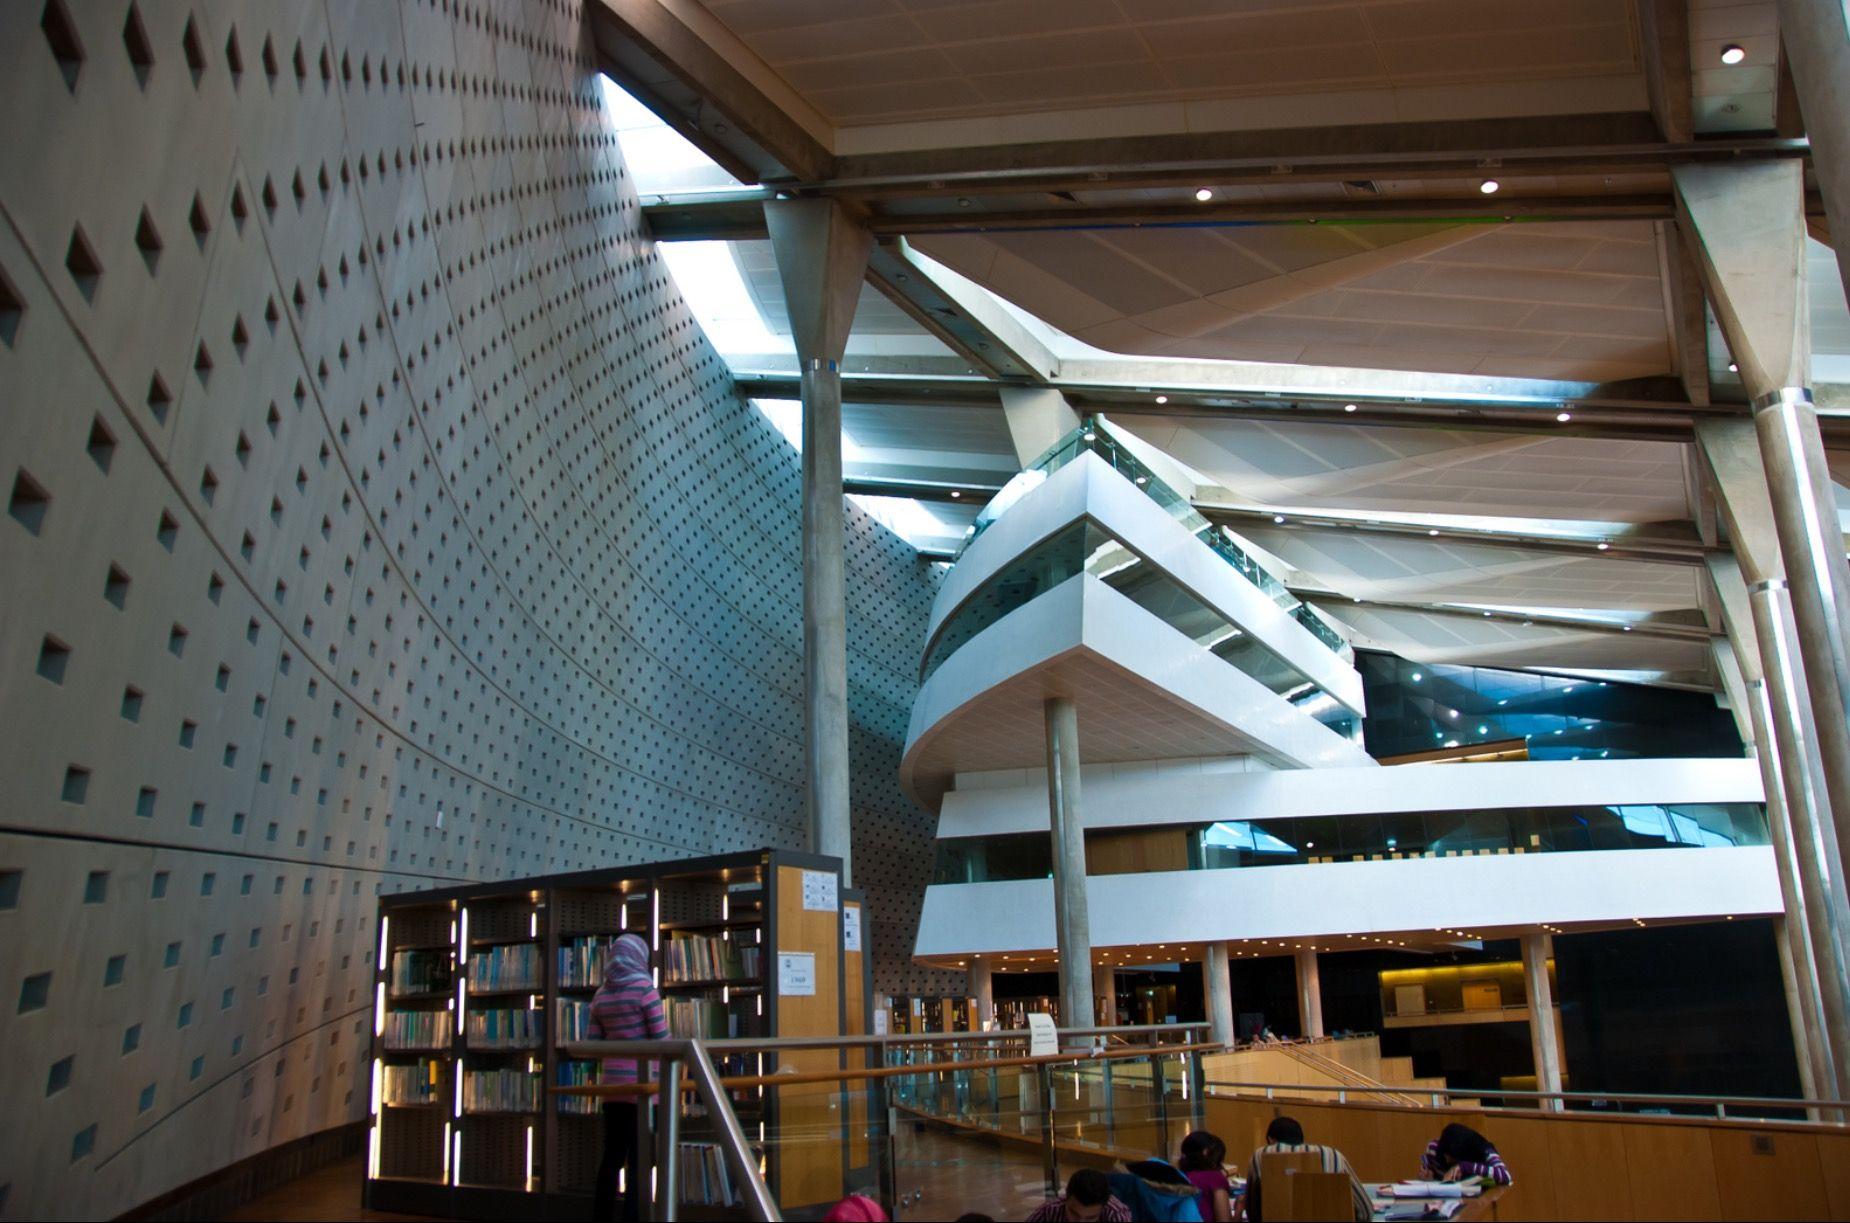 Bibliotheca alexandrina egypt places interior alexandria egypt indoor interieur